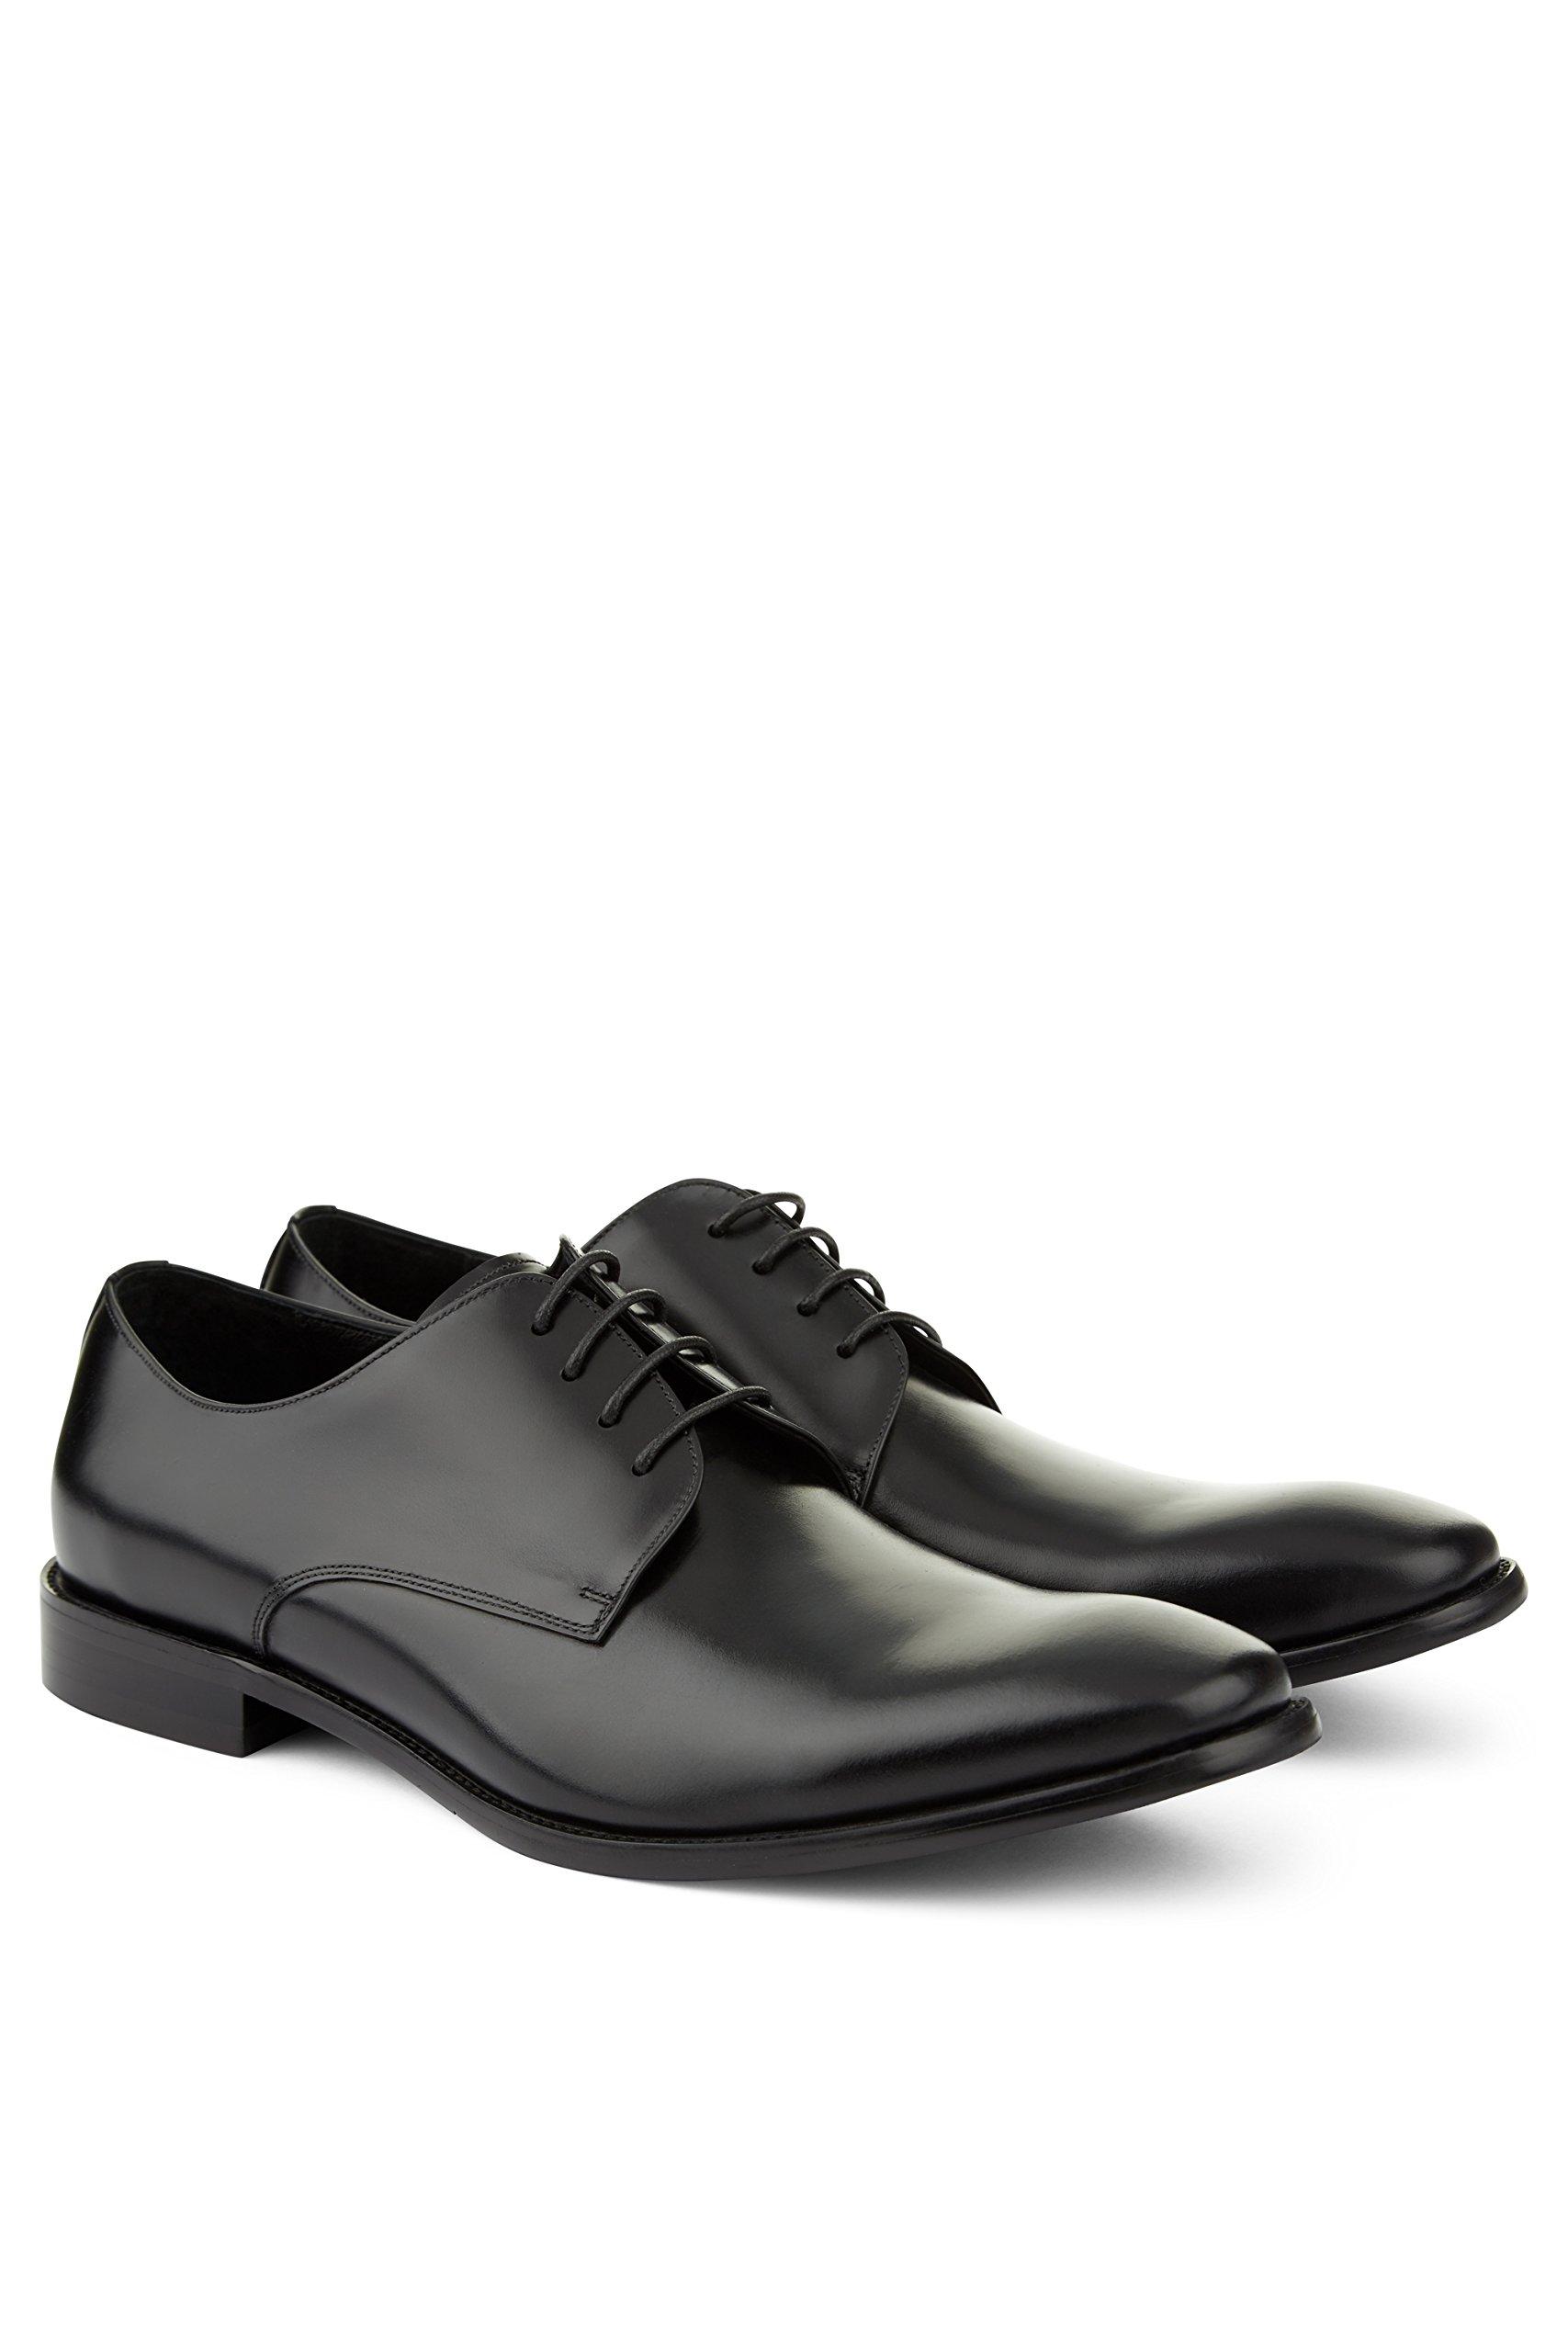 John White Men's Moore Black Derby Shoes 9.5 by John White